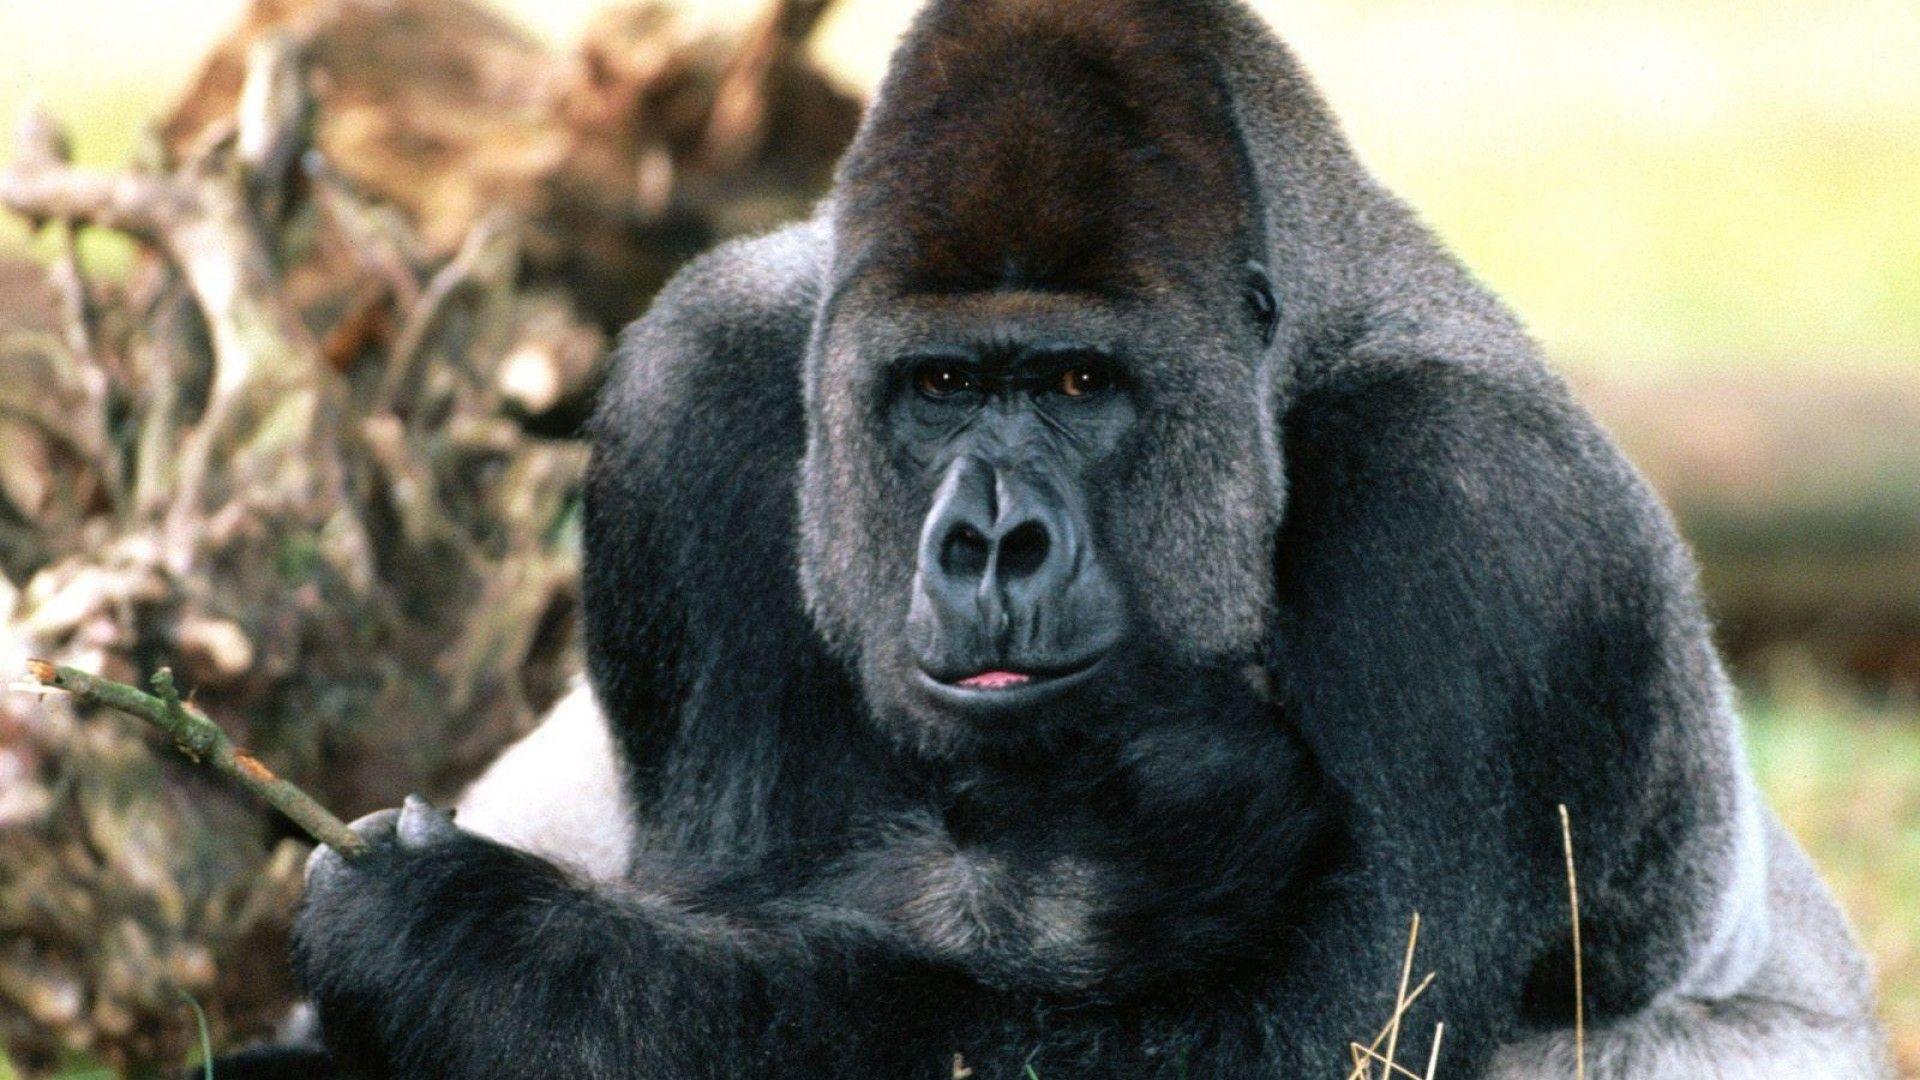 Gorilla Hd Wallpapers Gorilla Pet Monkey Silverback Gorilla Strength